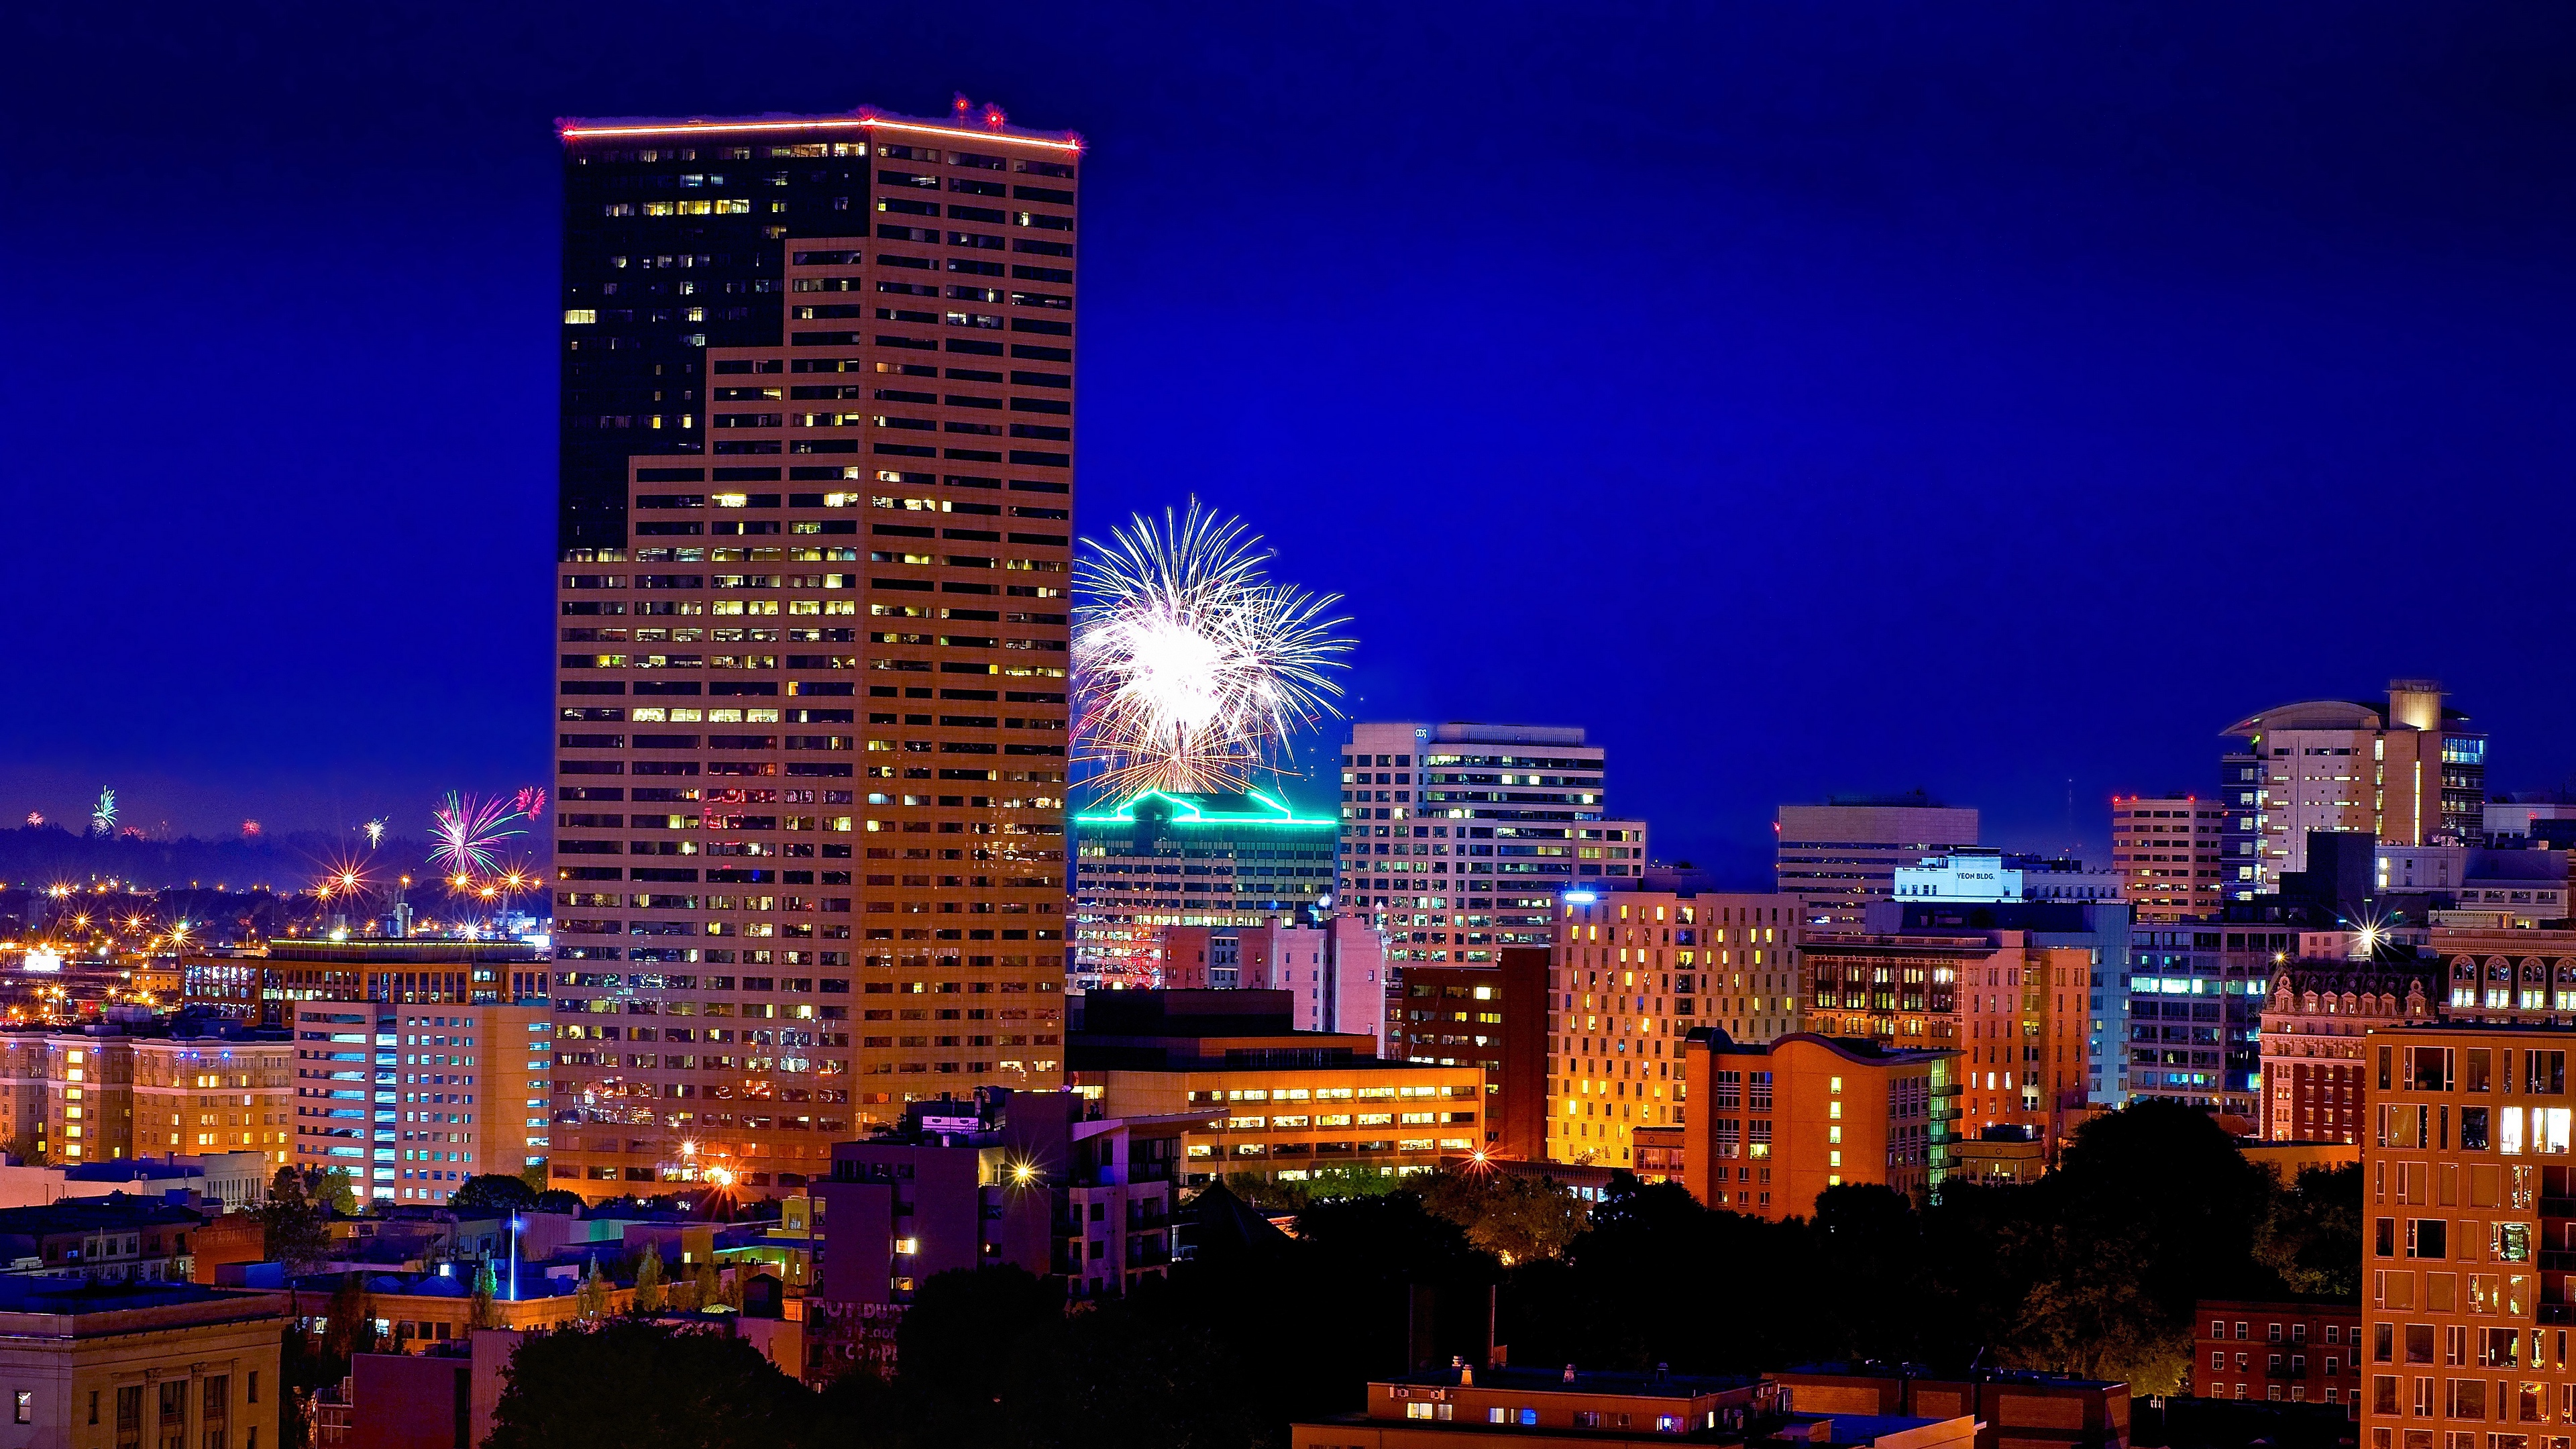 portland oregon night city fireworks 4k 1538067247 - portland, oregon, night city, fireworks 4k - Portland, Oregon, night city